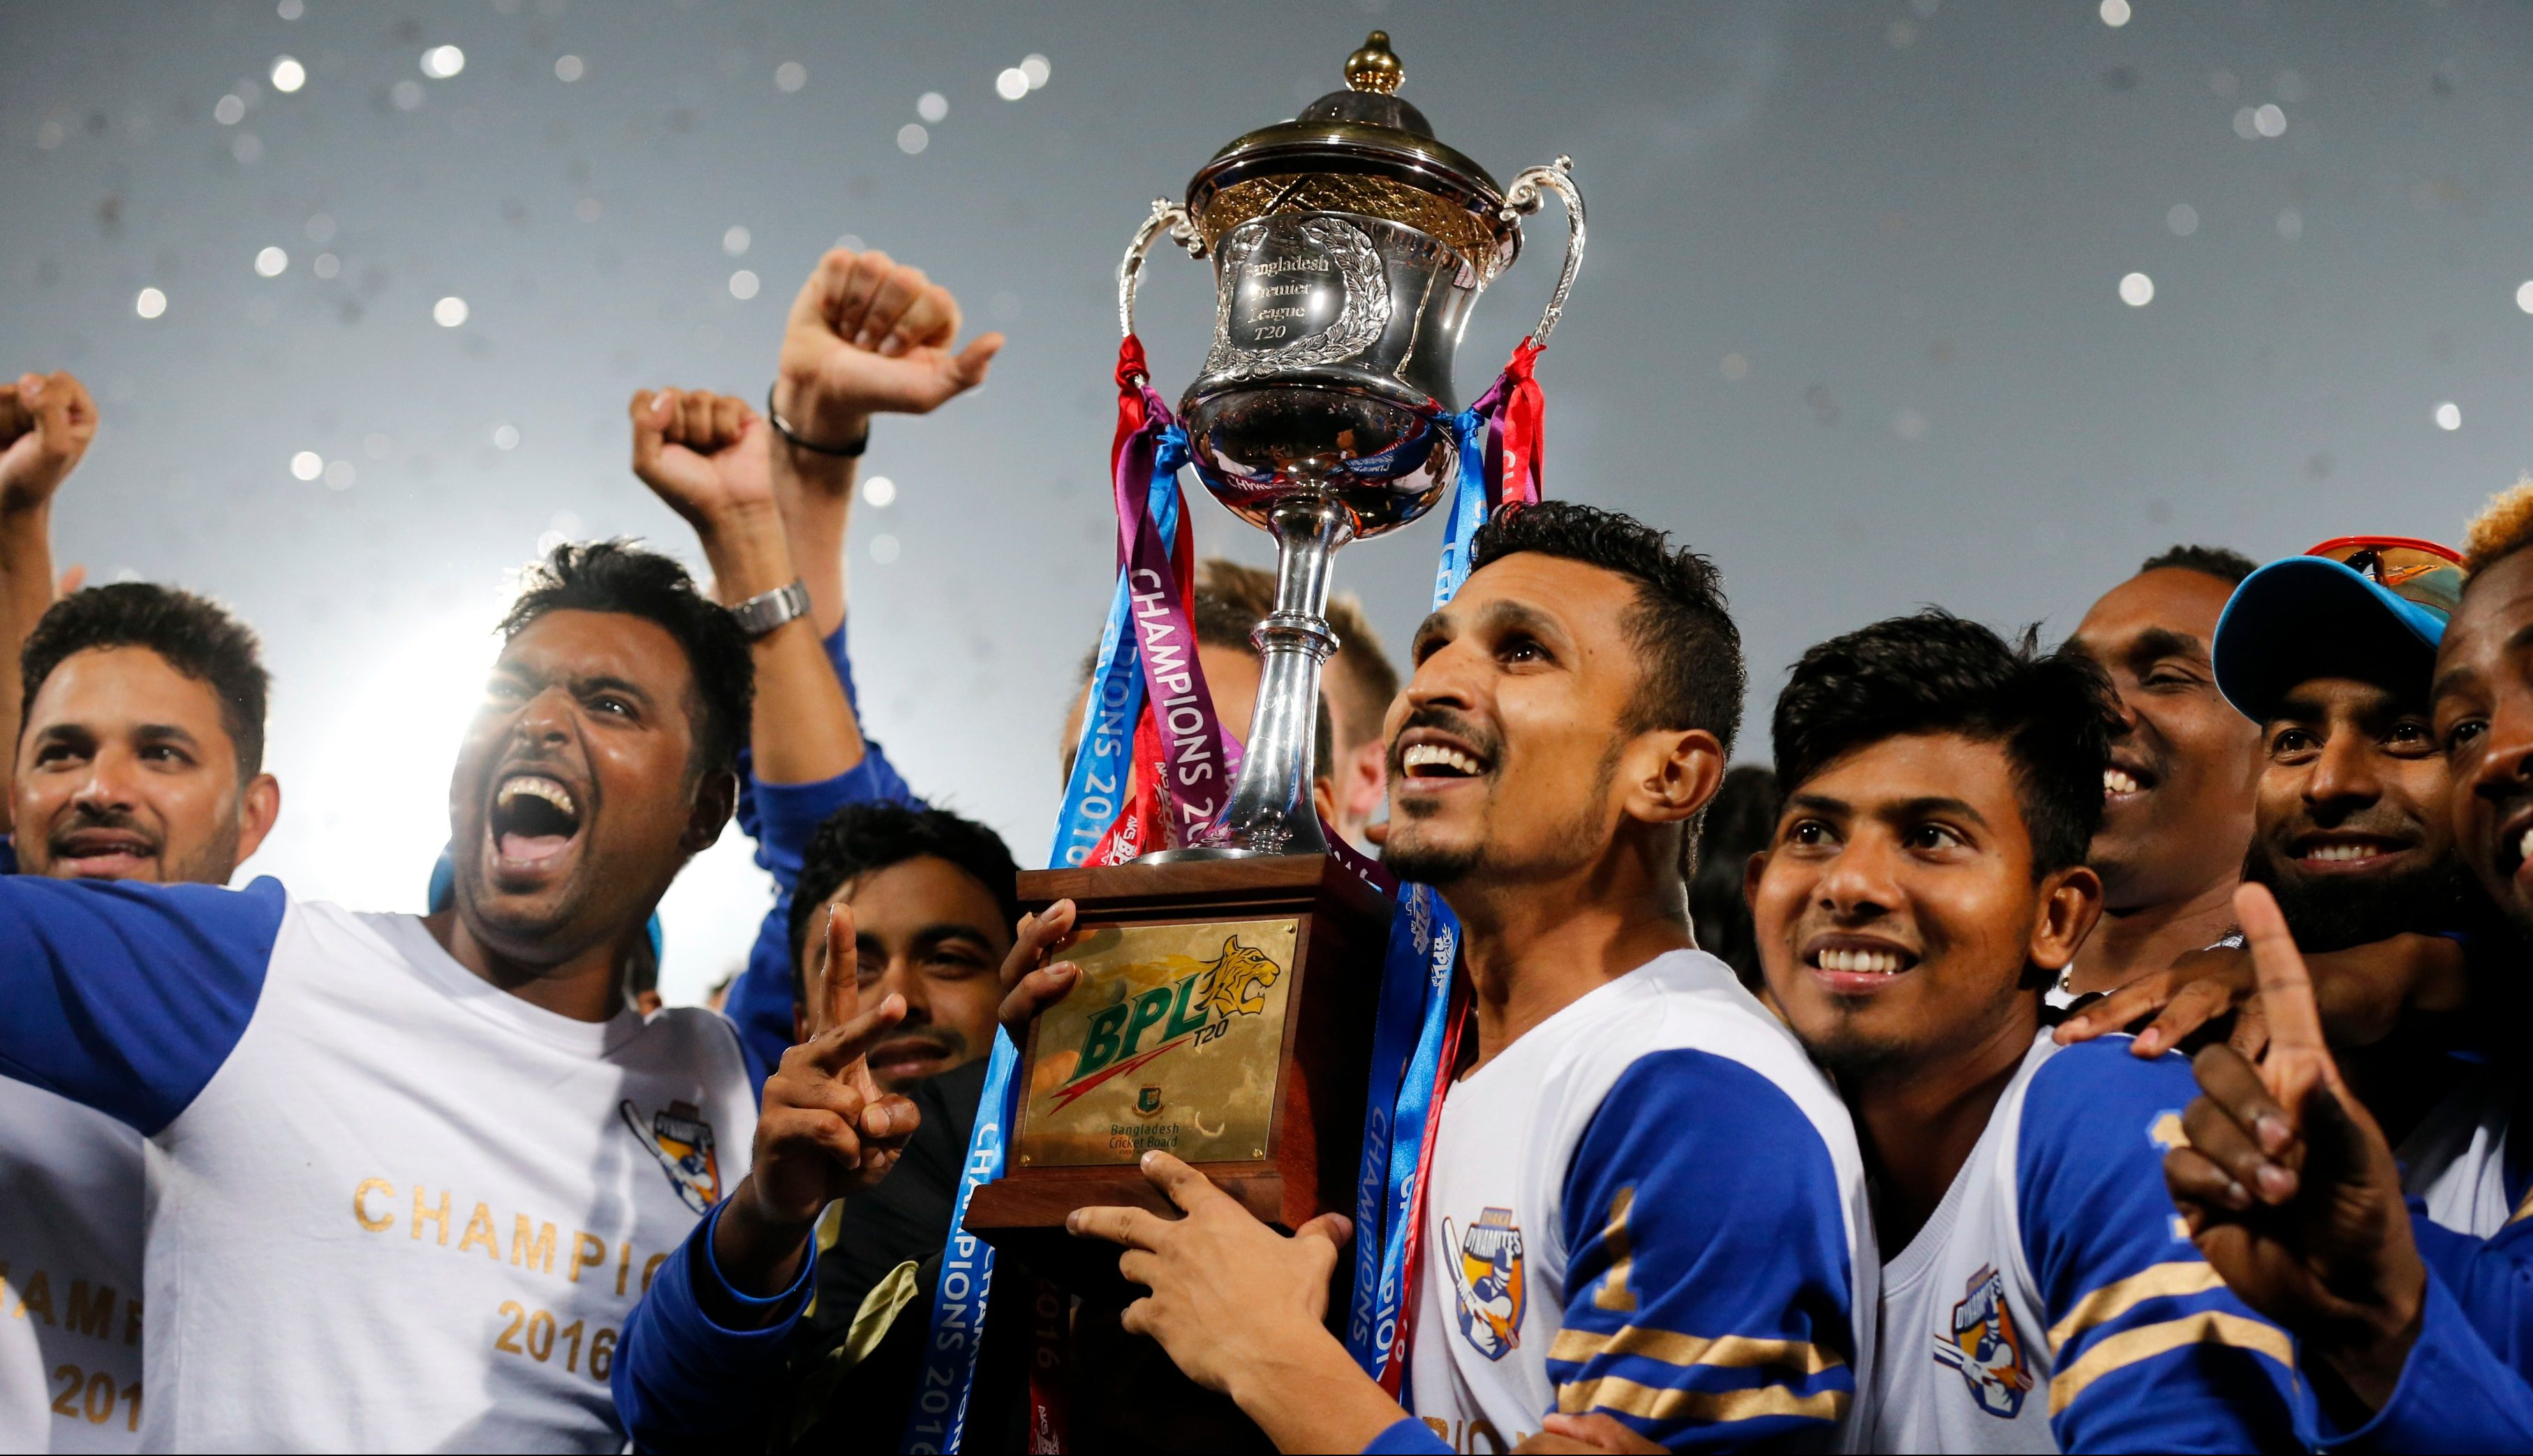 BPL - Bangladesh Premier League Champions - Dhaka Platoon